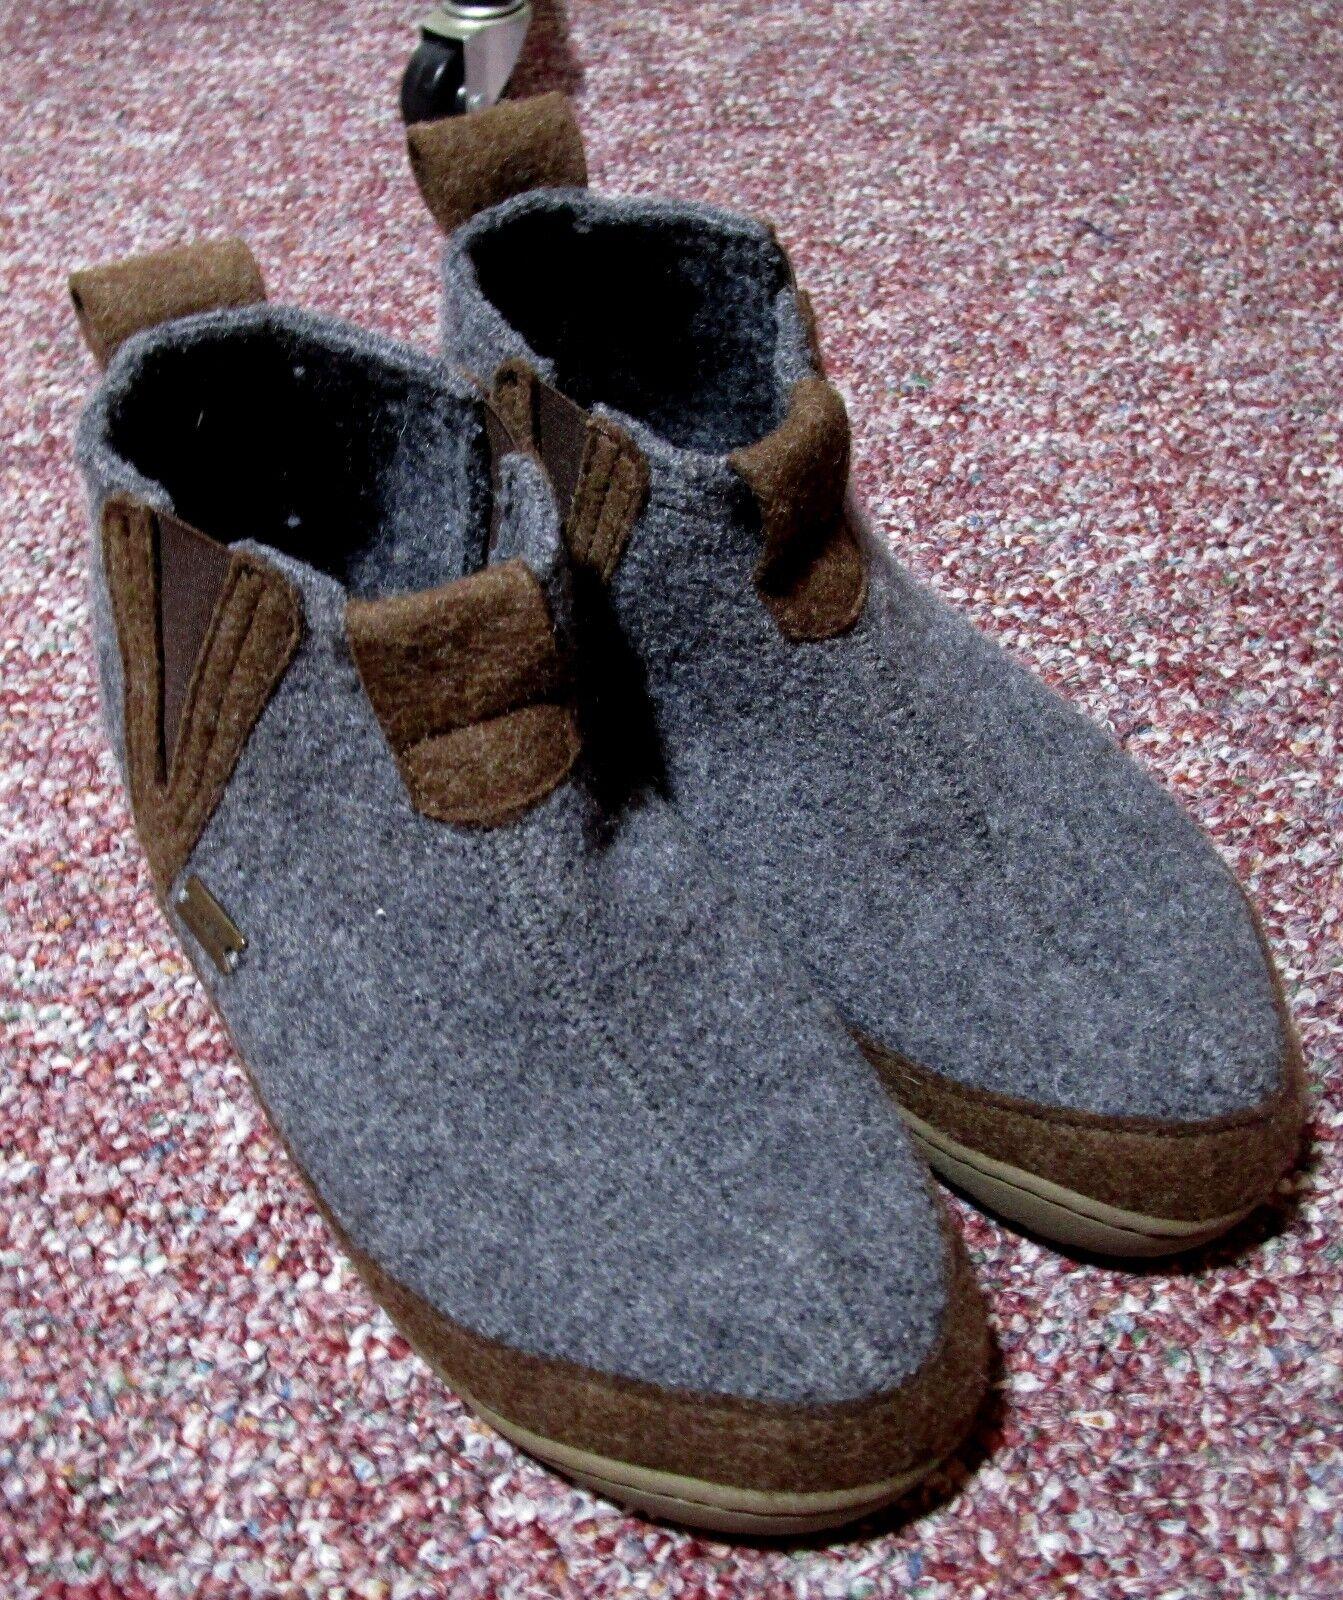 d324a651f8de9 Men's HAFLINGER Gray Wool Wool Wool Moccasin Ankle Boots Size 7 US, (38)